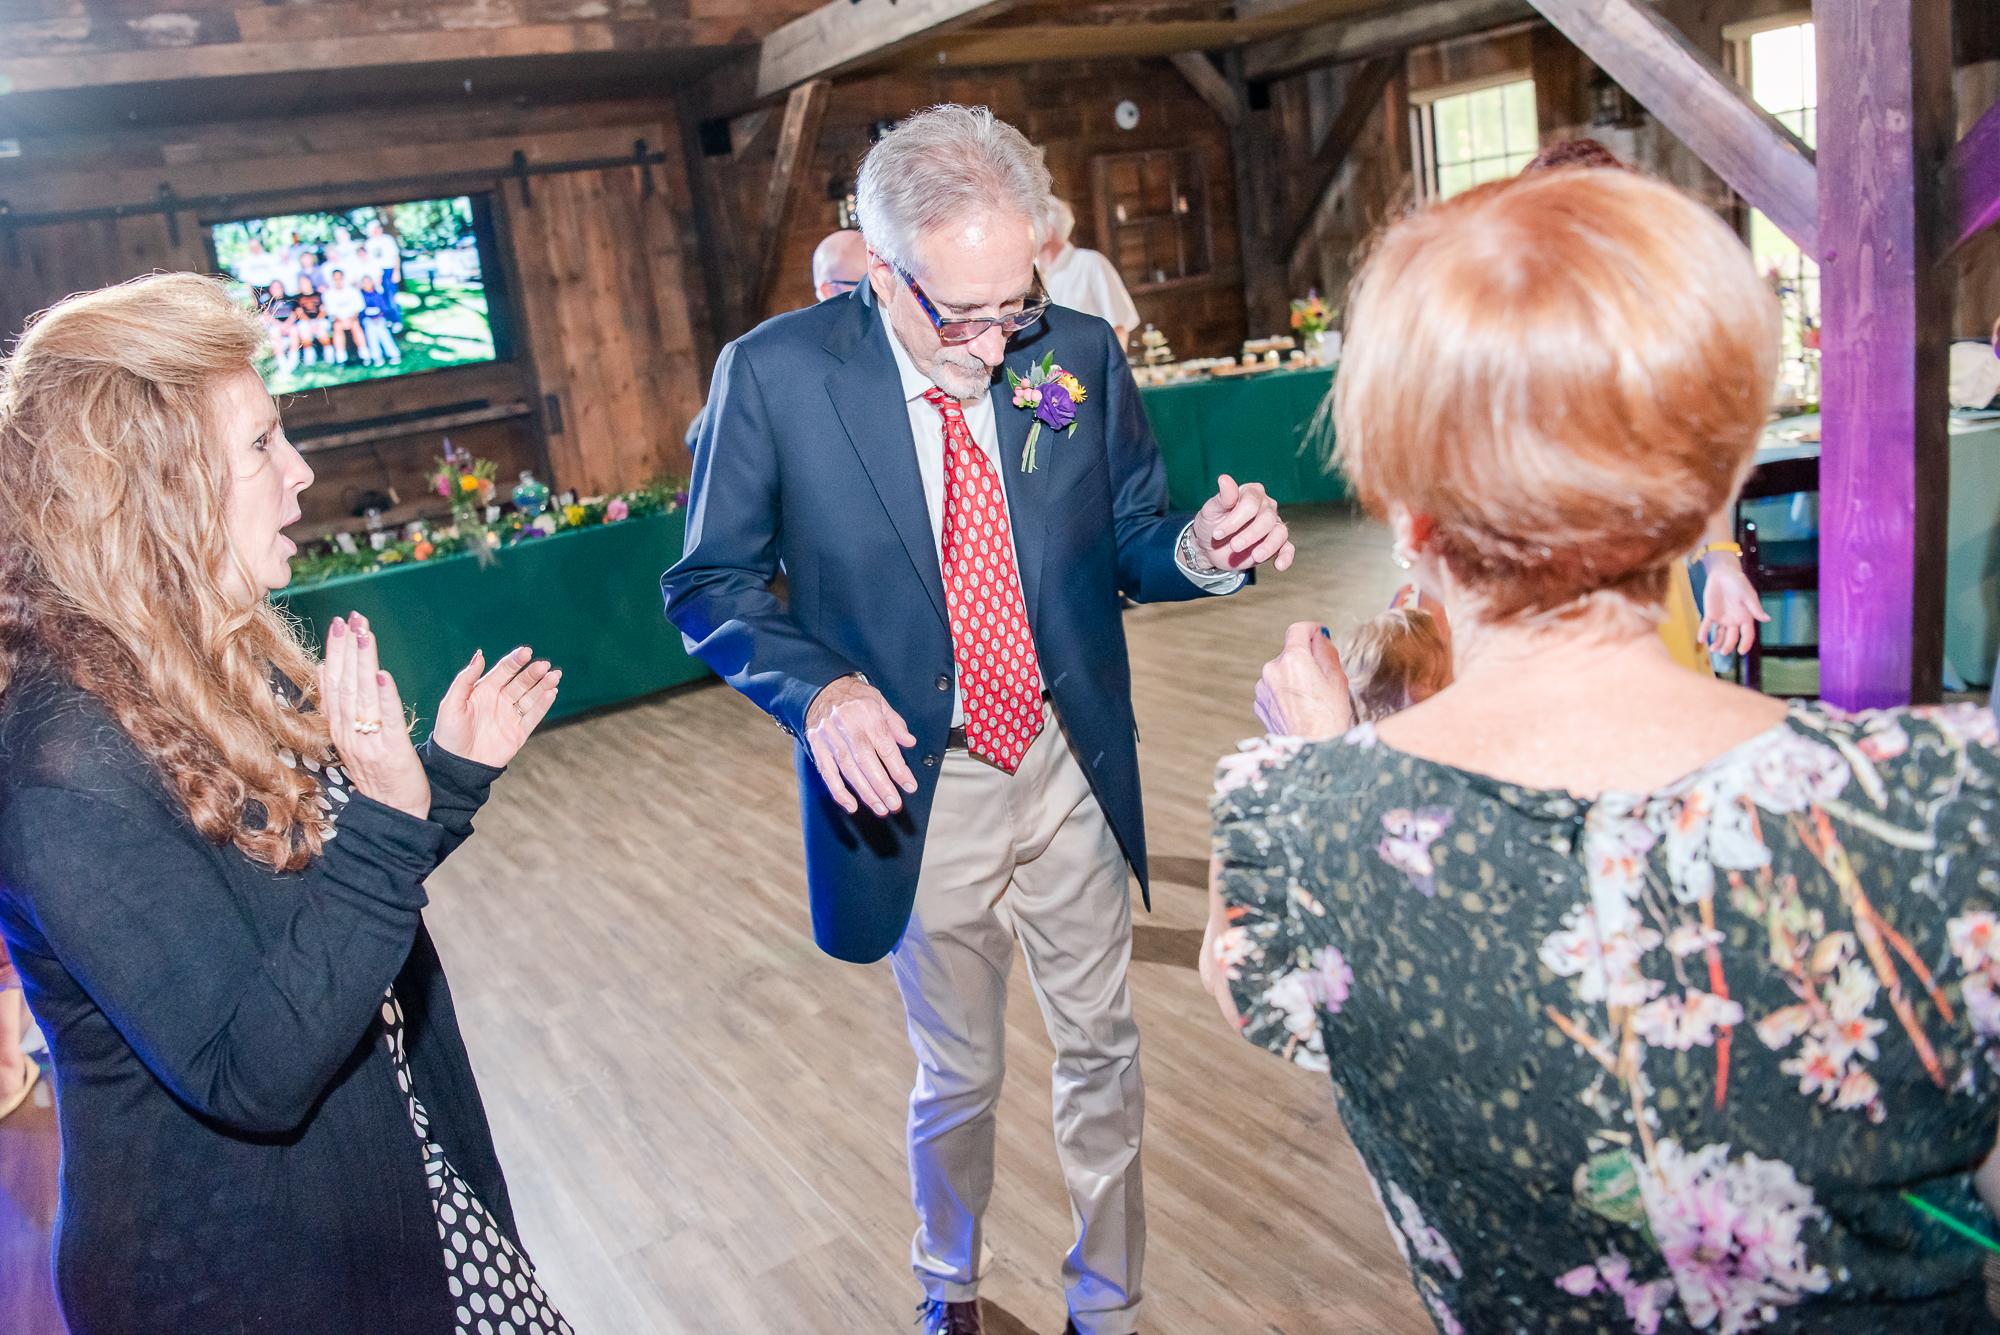 Maria+Adam_Summer Barn Wedding_The Barn at The North Star Preserve_Oberlin_Ohio-212.jpg